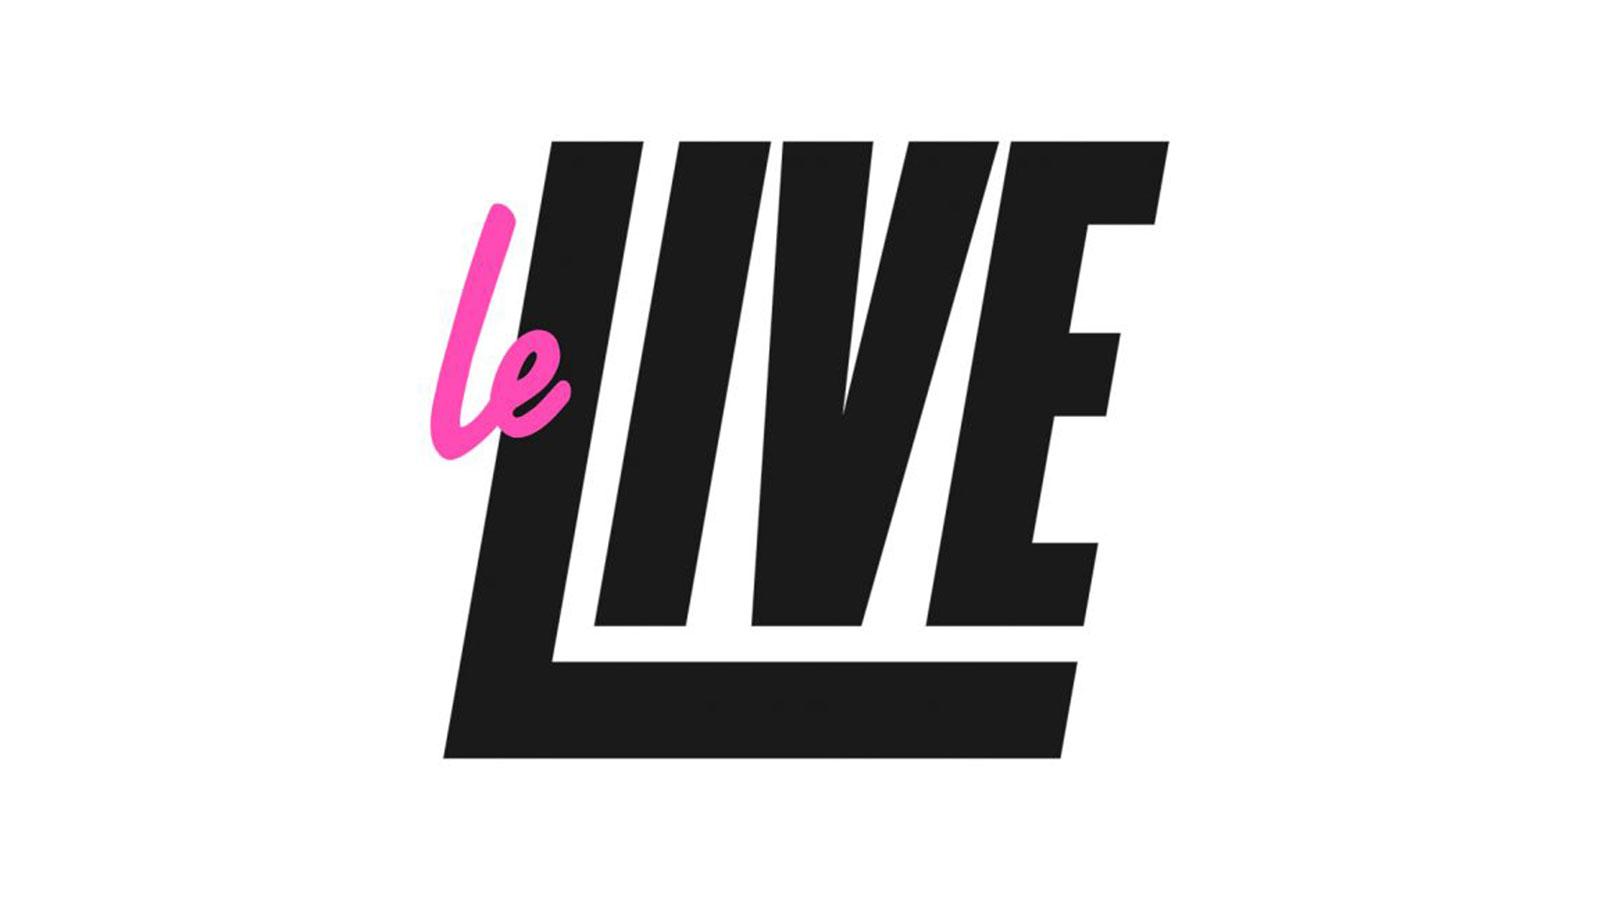 Webedia lance LeLive